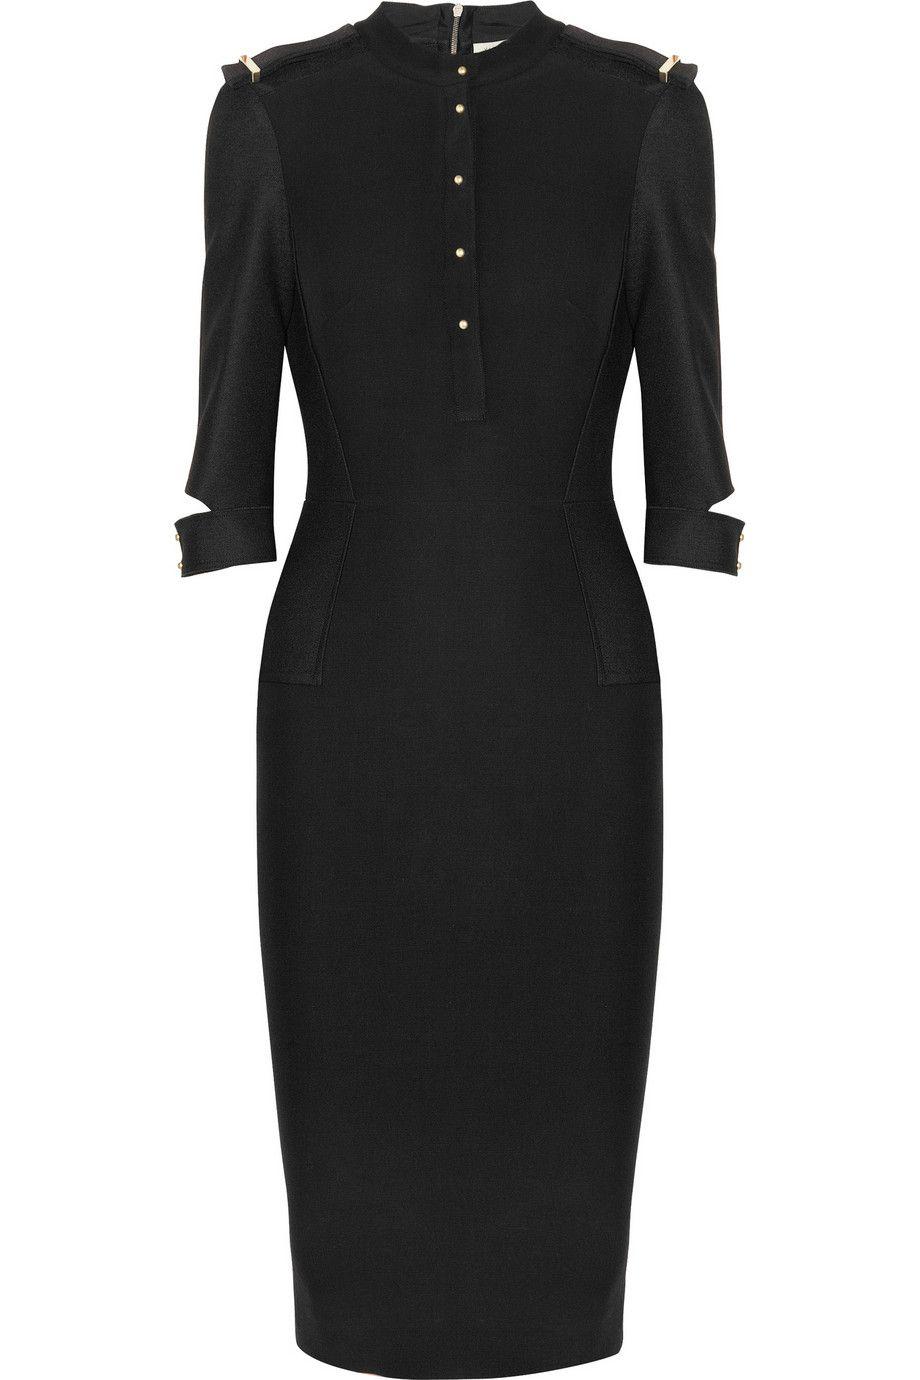 Victoria Beckham Black Silk And Wool Blend Crepe Dress Clothes Clothes Design Fashion [ 1380 x 920 Pixel ]